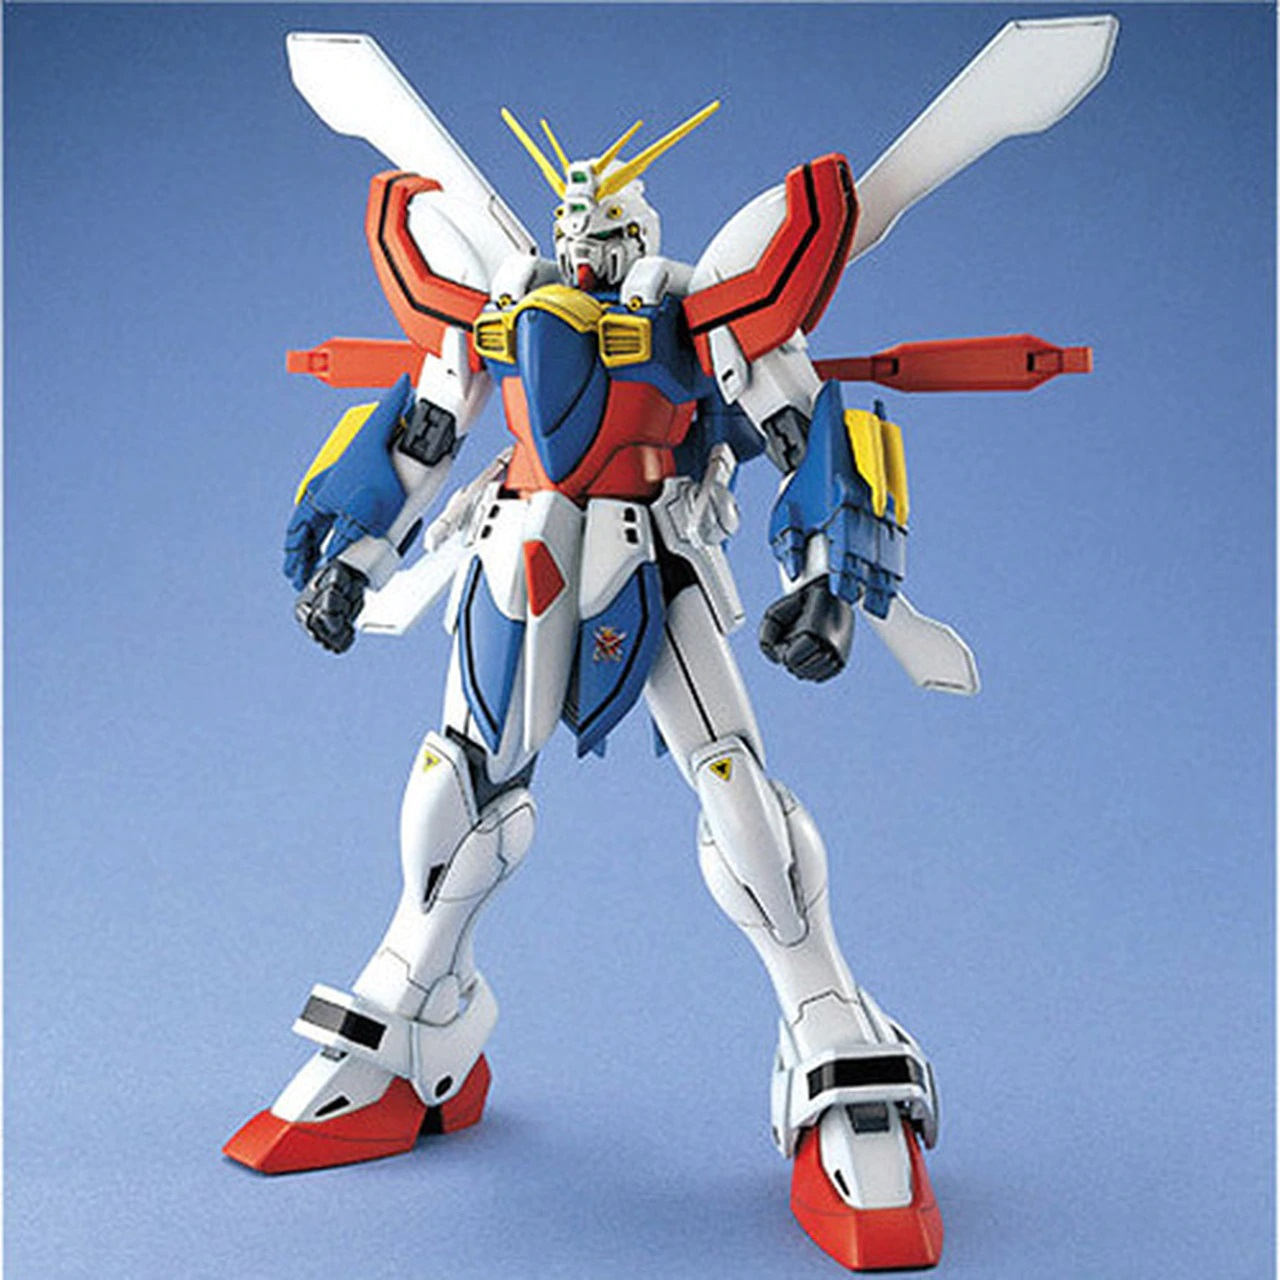 Bandai MG GF13_017NJ2 G Gundam